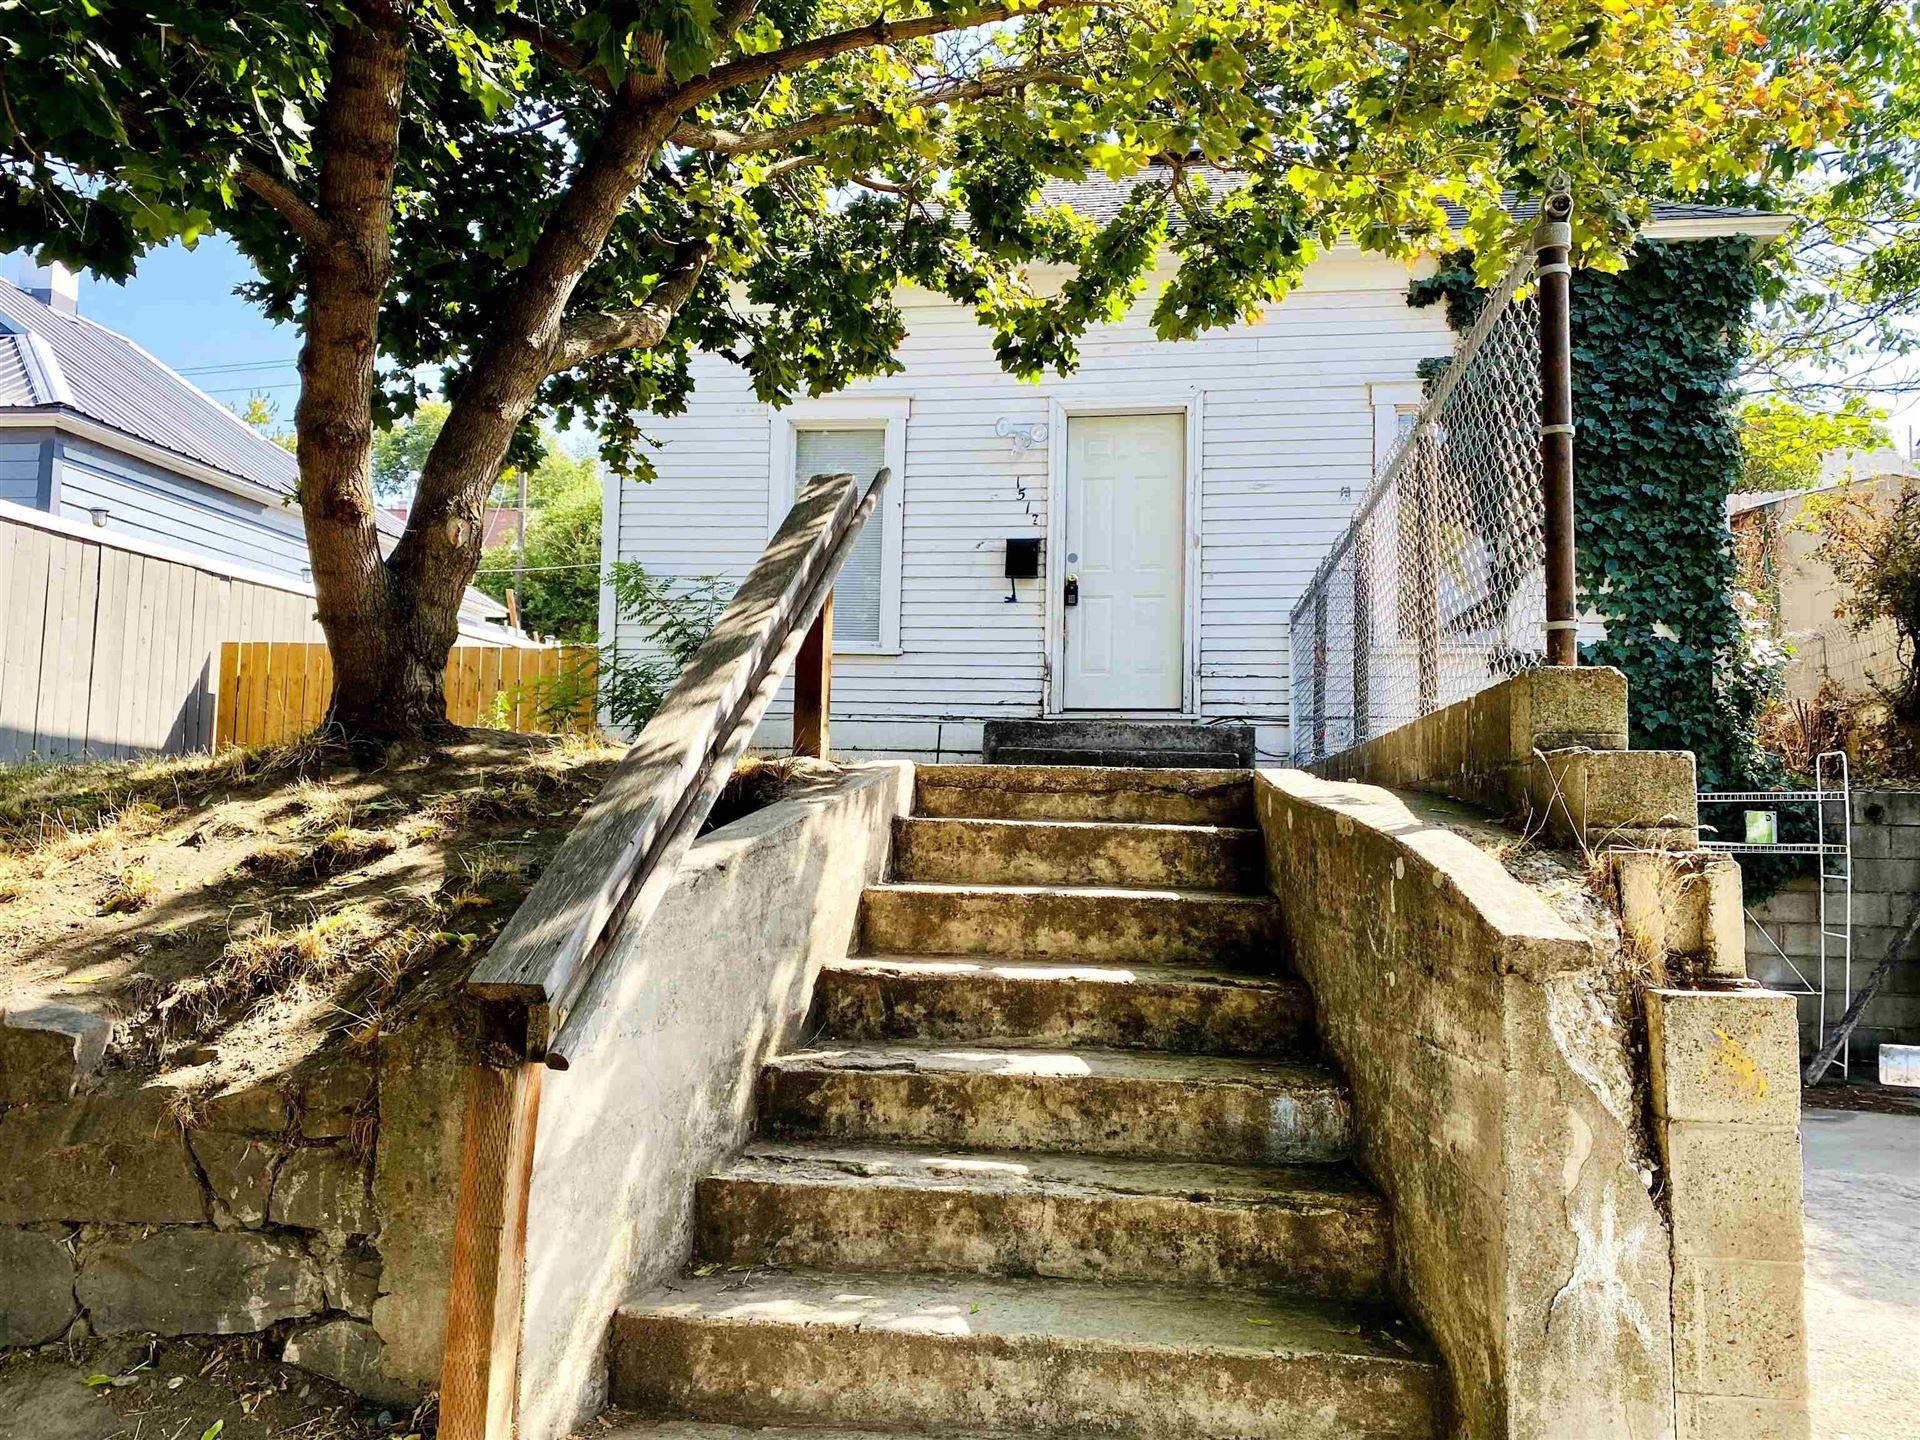 Photo of 1512 7th Ave, Lewiston, ID 83501 (MLS # 98816307)